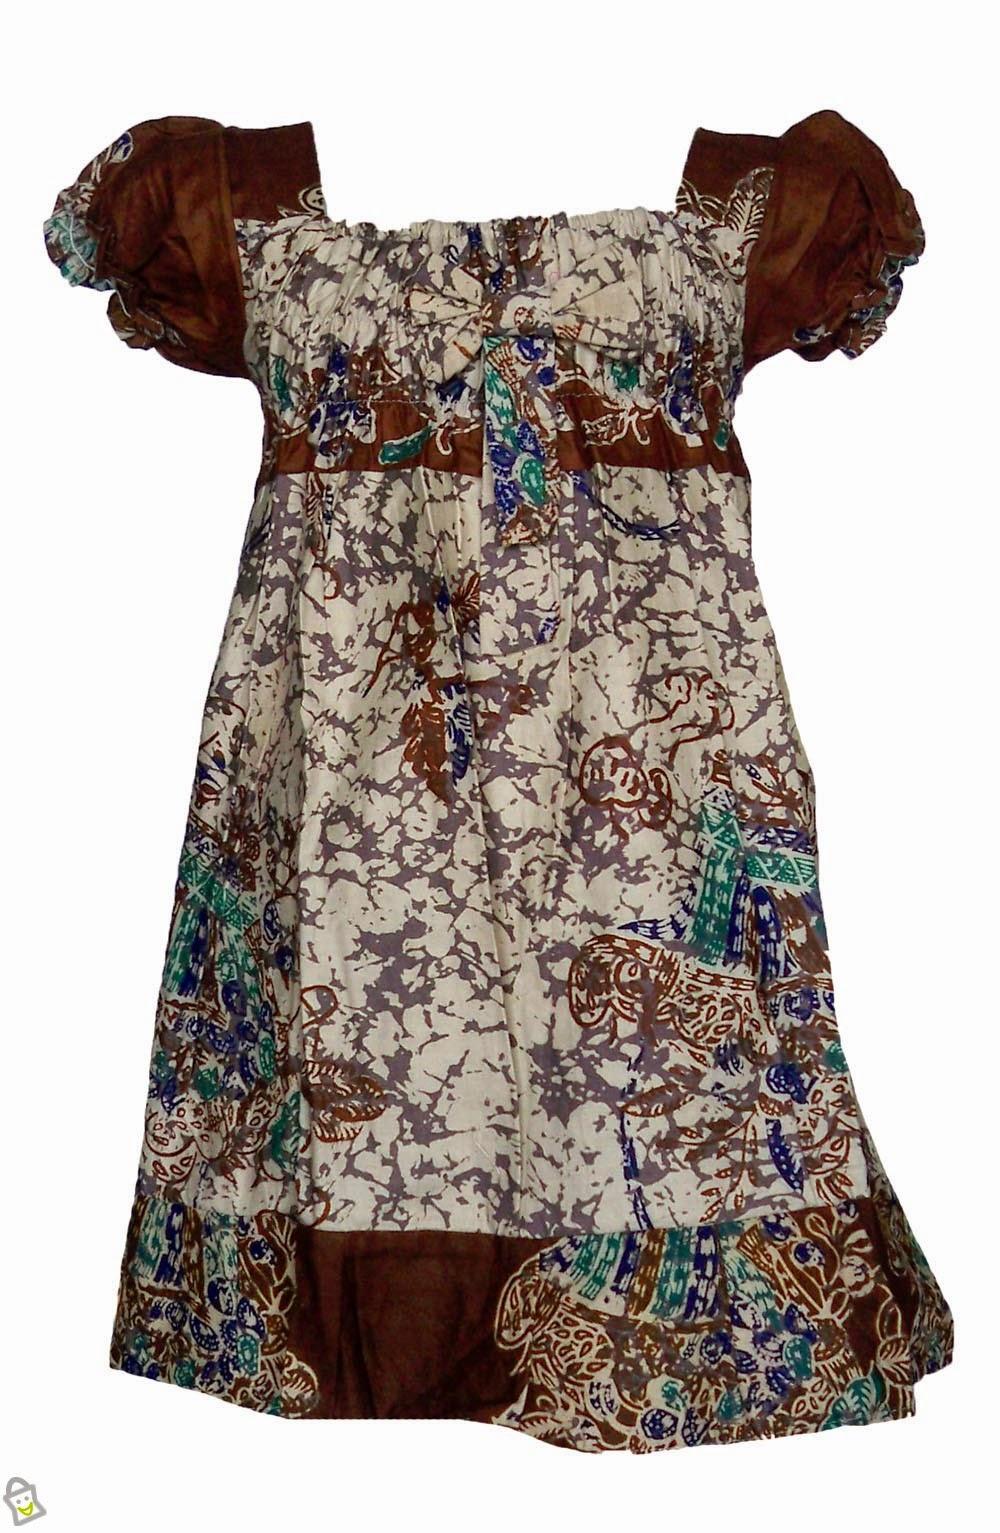 Kumpulan Model Baju Batik Modern Untuk Anak Perempuan Cinuy Blog